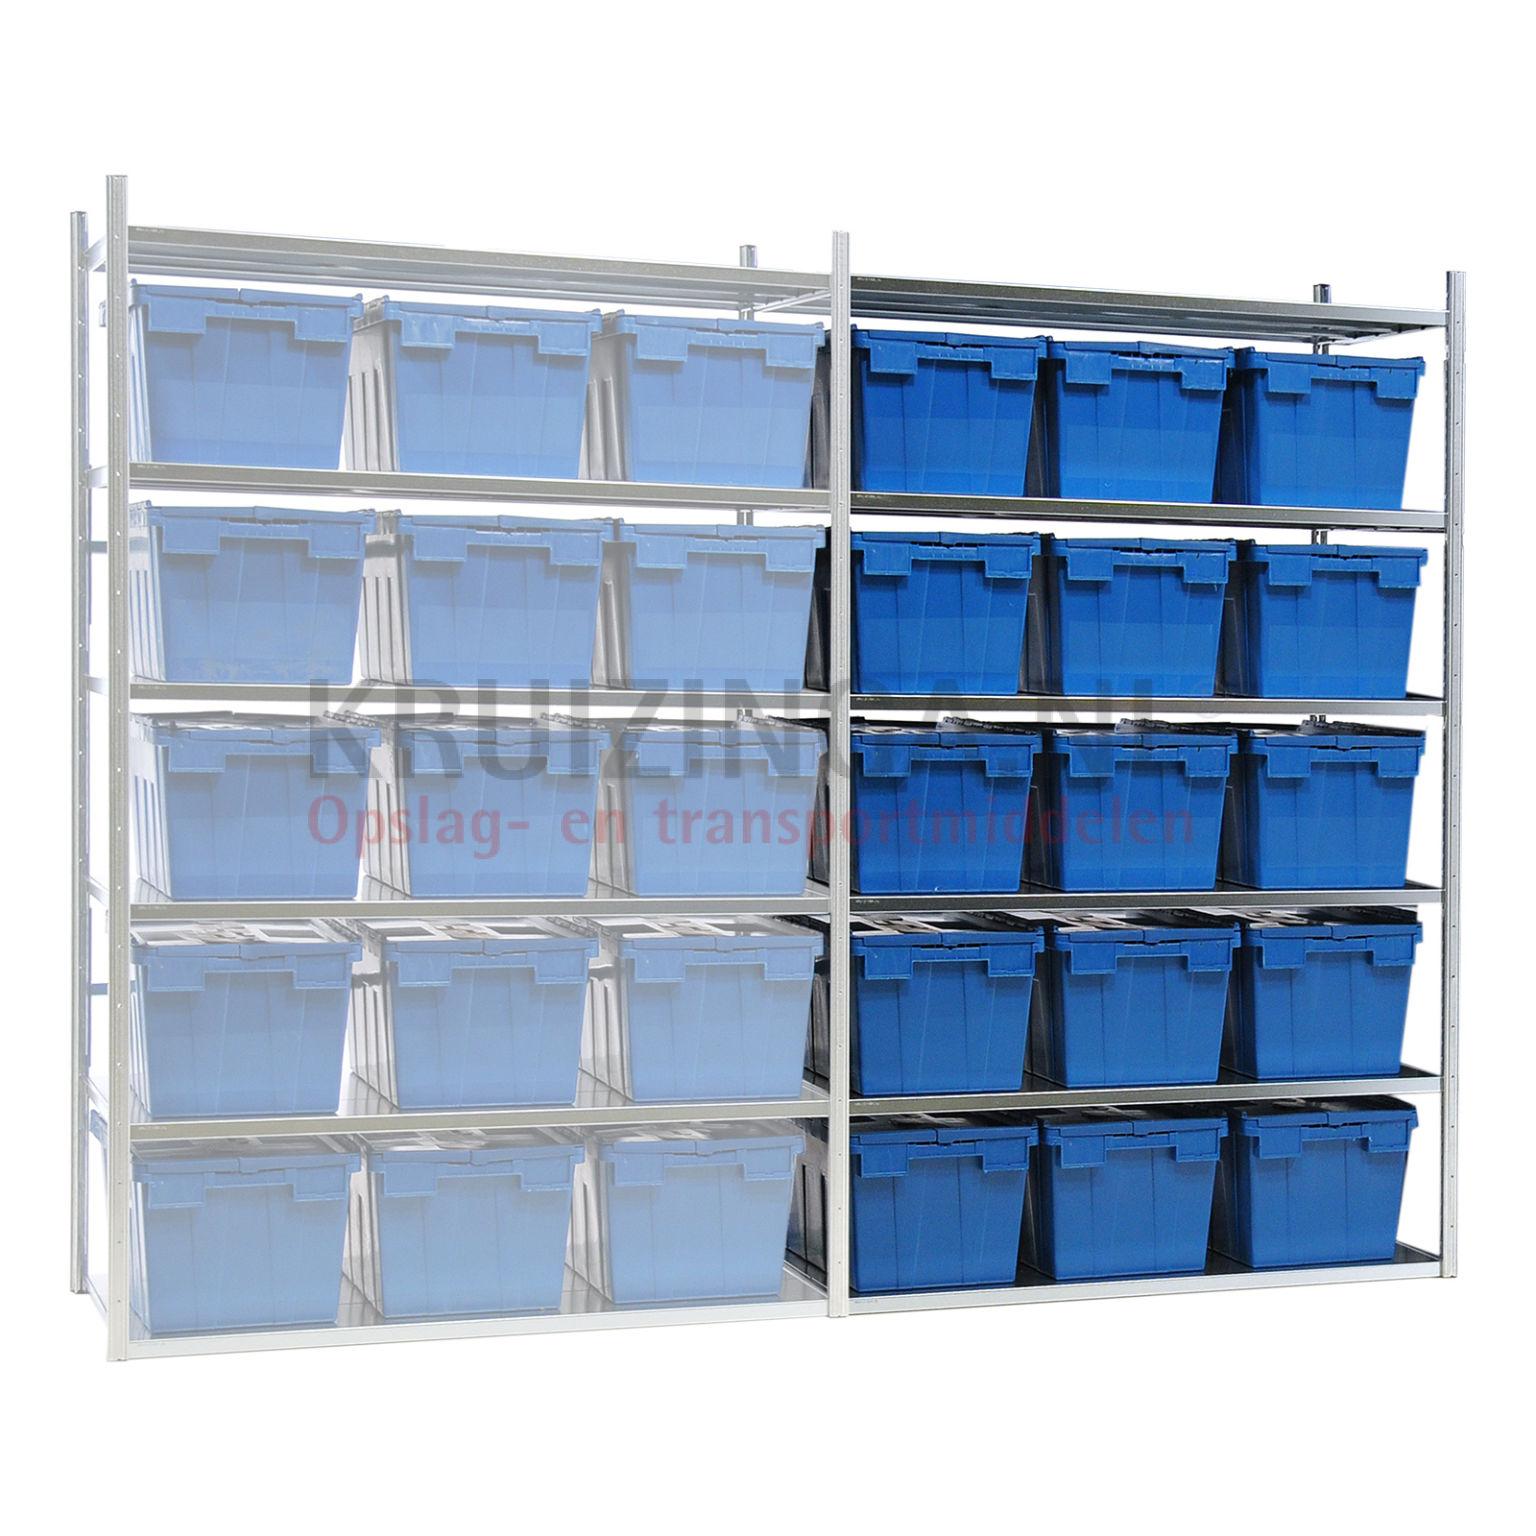 kombination satz regale kombination satz anbau inkl 15 stapelboxen mit deckel ab 372 38 frei. Black Bedroom Furniture Sets. Home Design Ideas